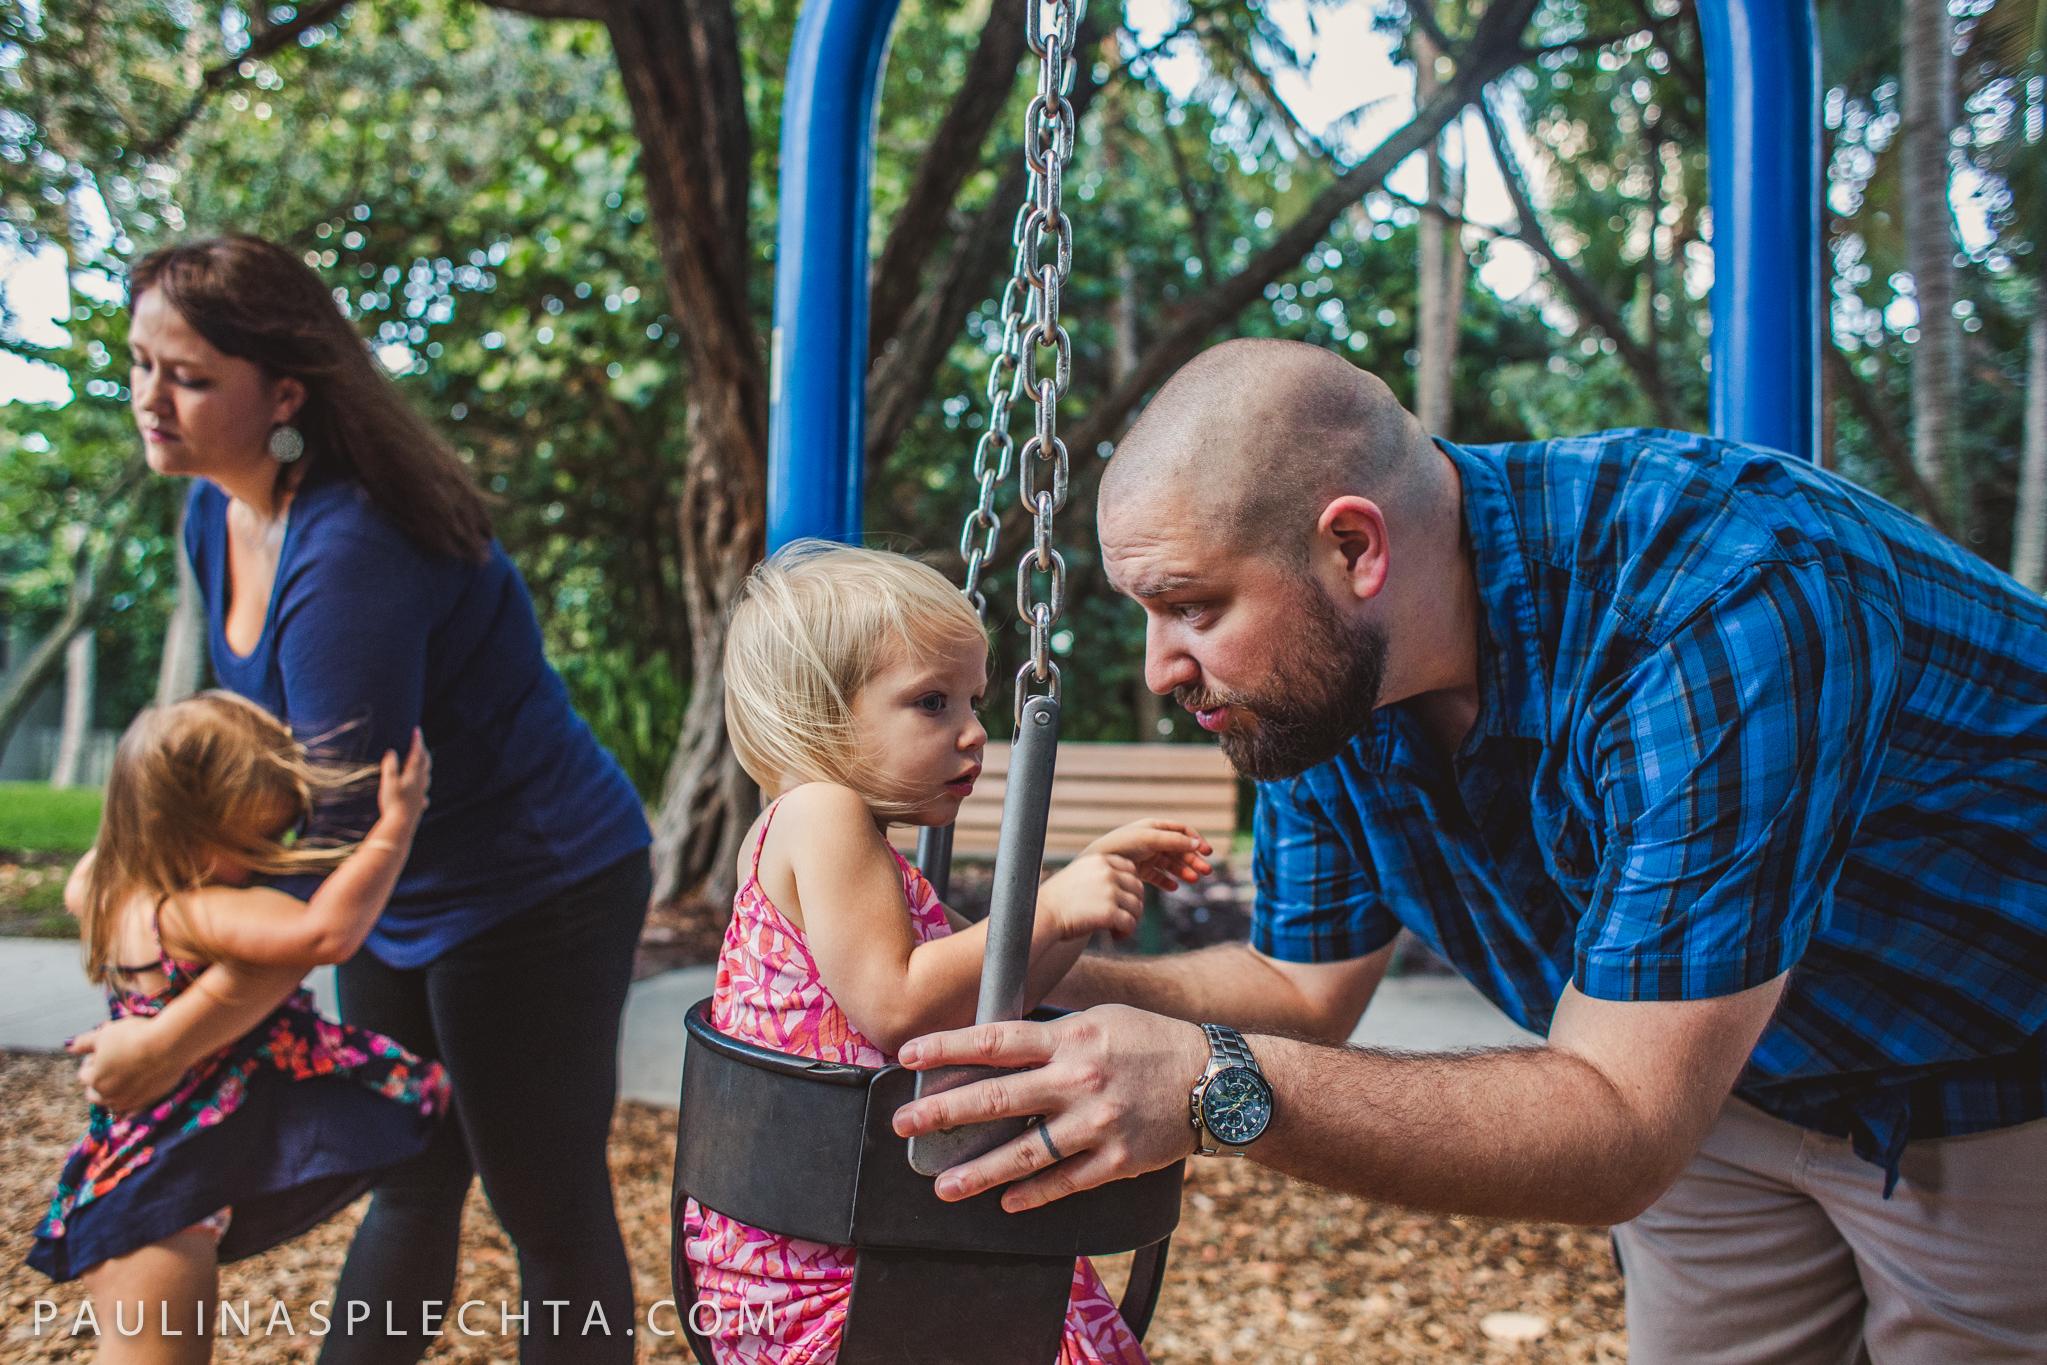 Family Photographer South Florida Pompano Broward Palm Beach Babies Baby Newborn Breastfeeding Birth Photograpy Beach Home Documentary Session-29.jpg